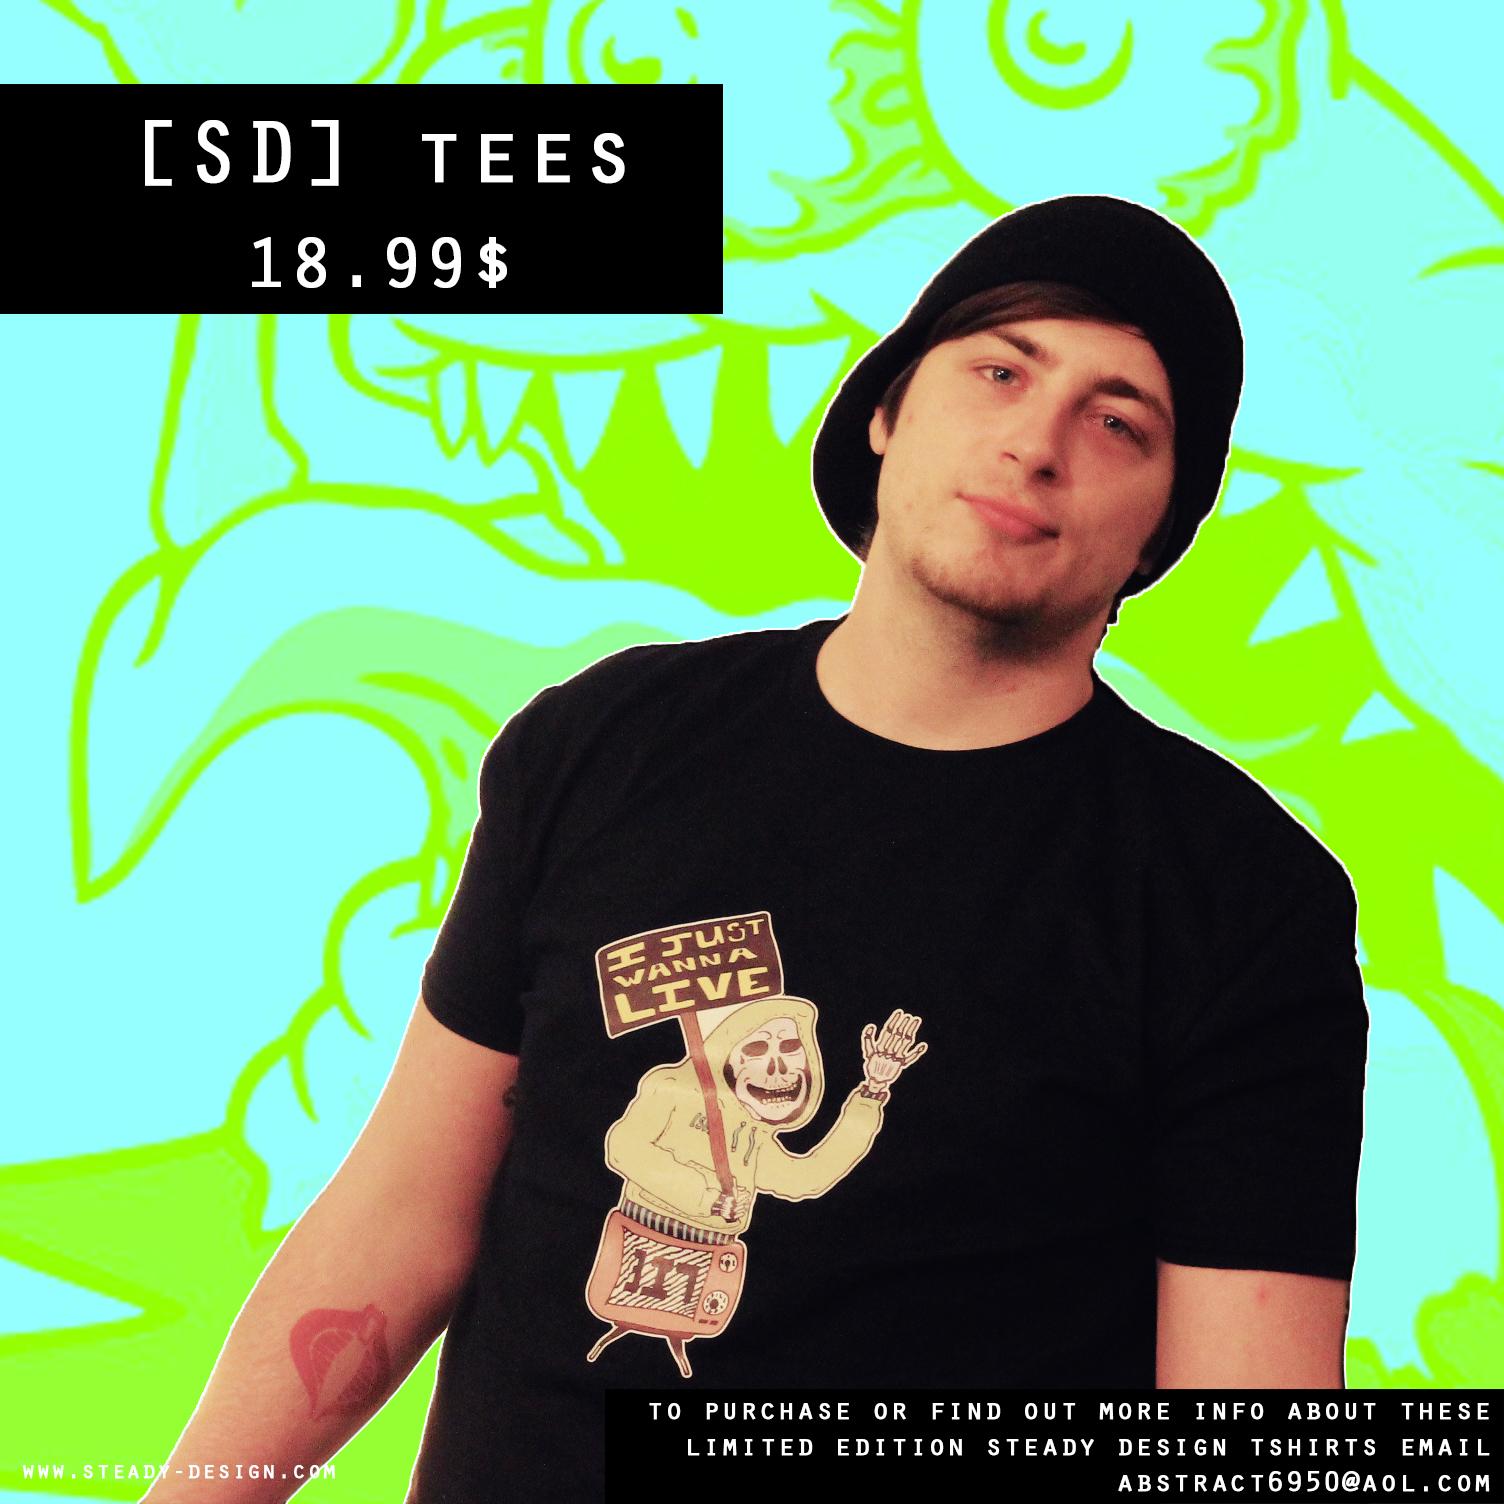 [SD] TEES web ad